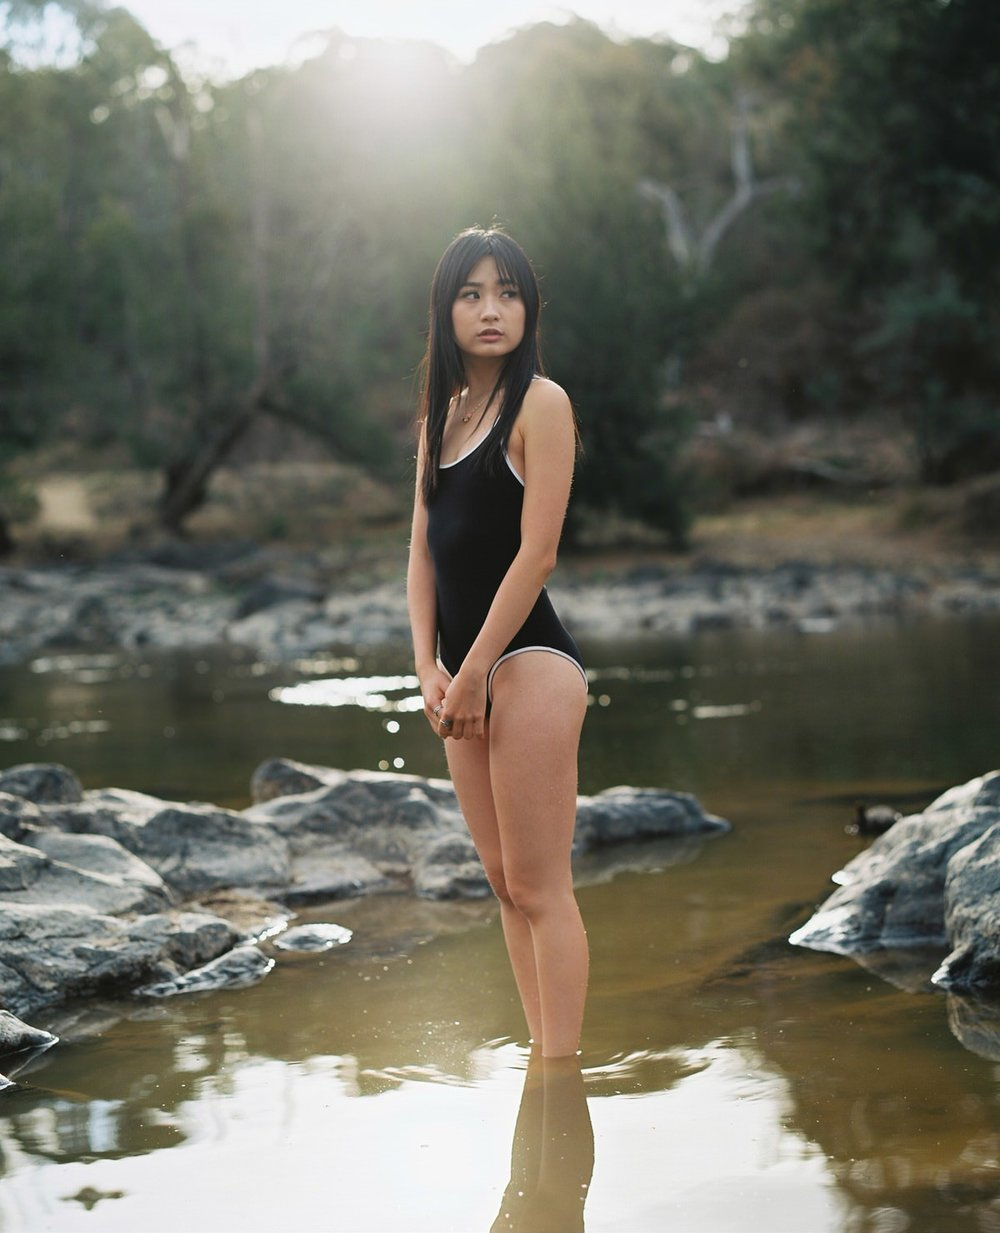 Photographer - Jace Martin